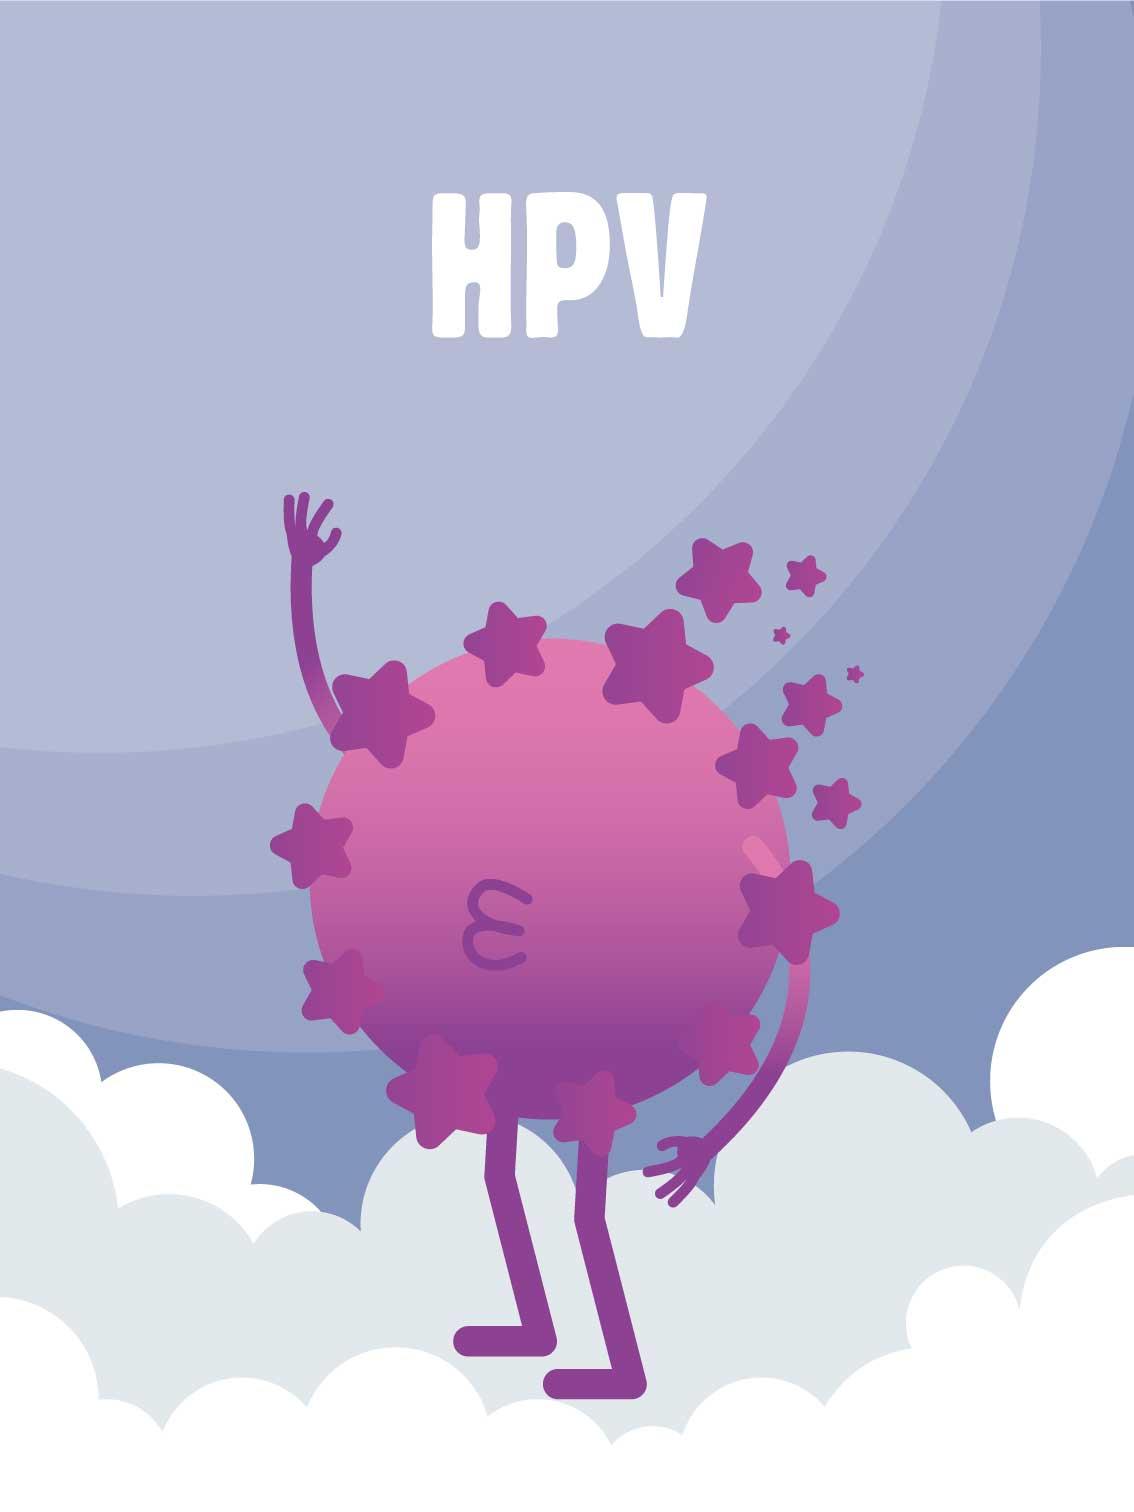 Papillomavirus comment l attraper, FDA OKs HPV vaccine to age 45 hpv erkrankung manner